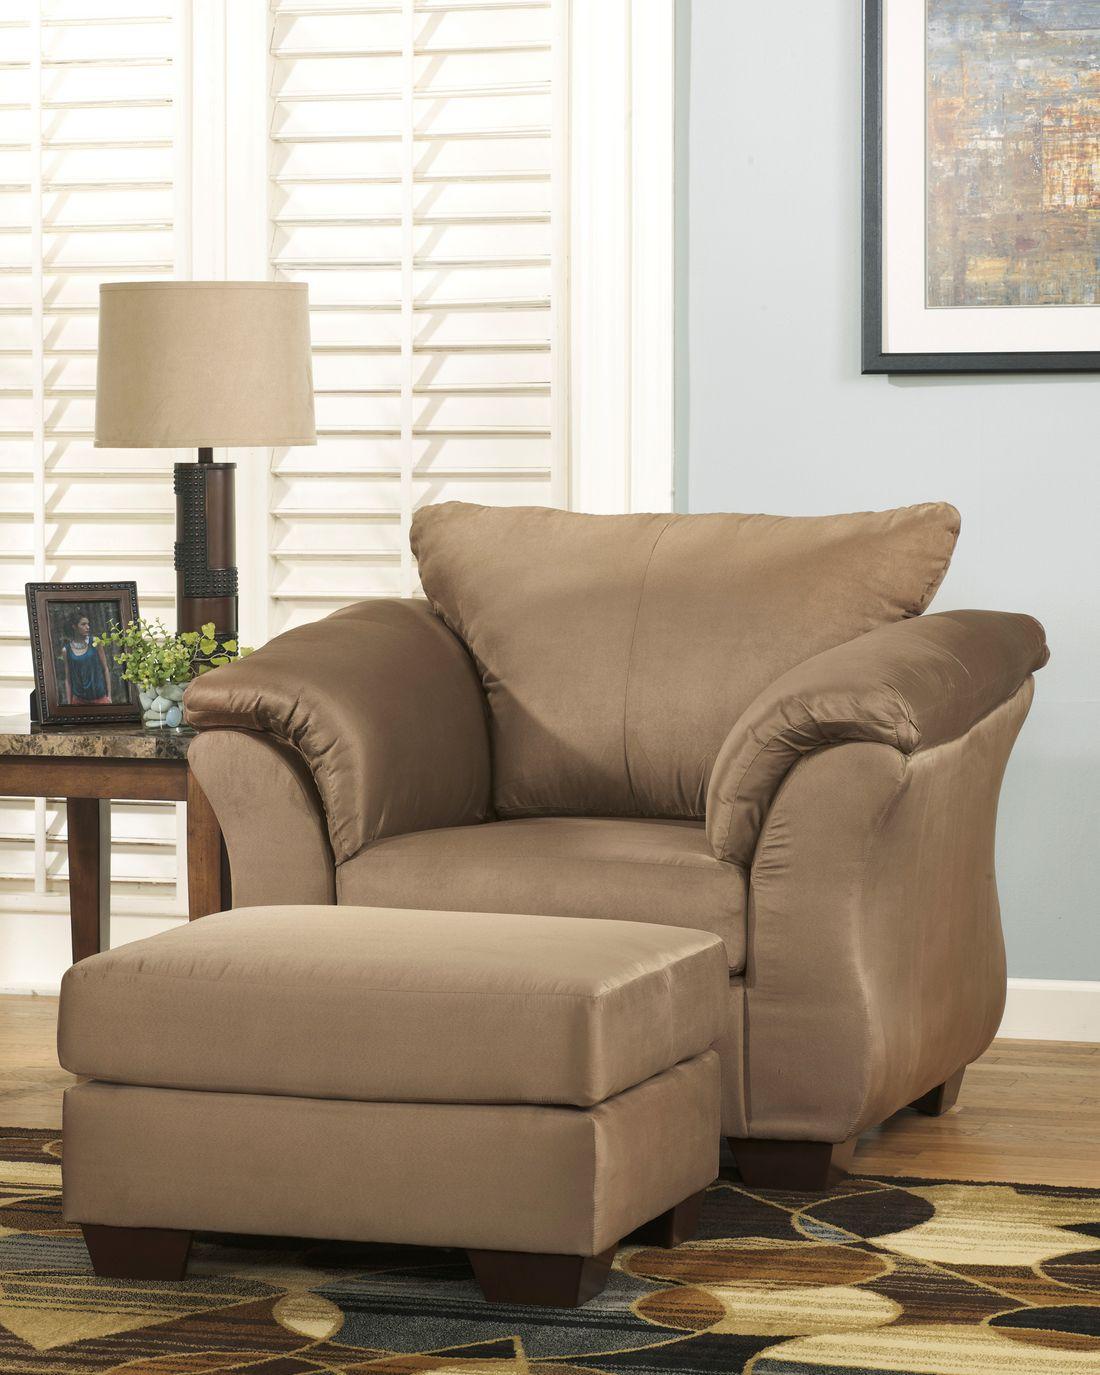 living room amazing chair ottoman set modern with brown ashl